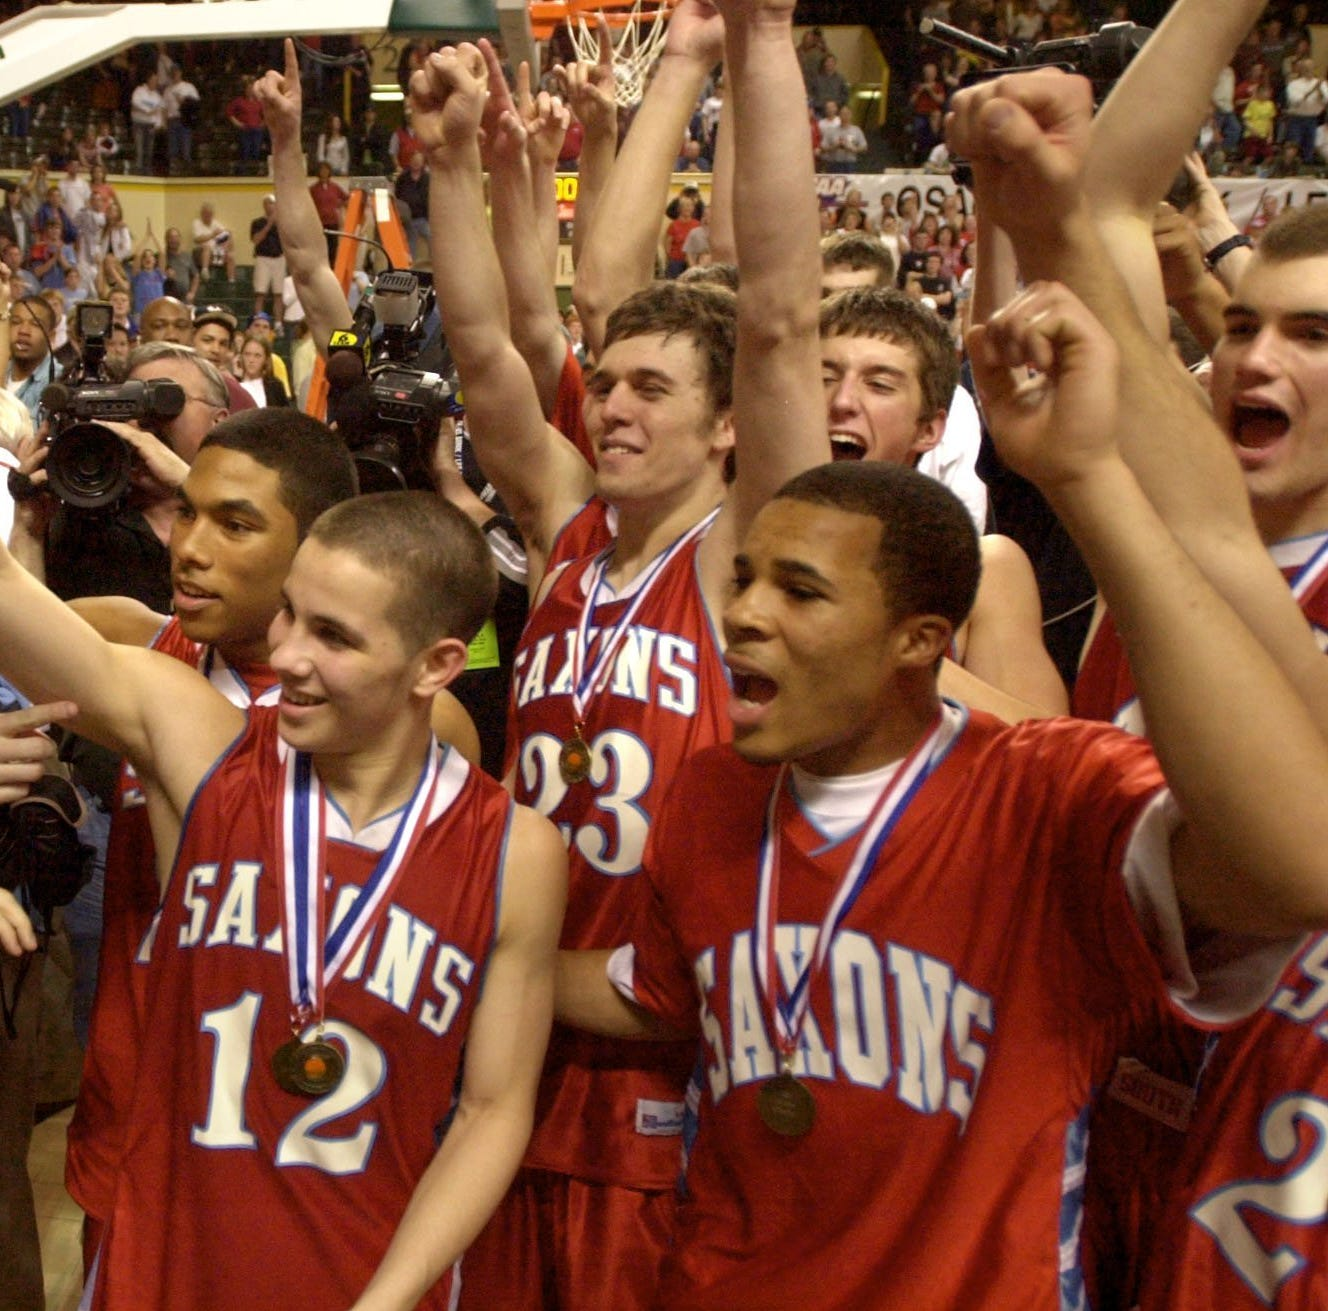 2004 South Salem Saxons: Remembering Salem-Keizer's last boys basketball state title